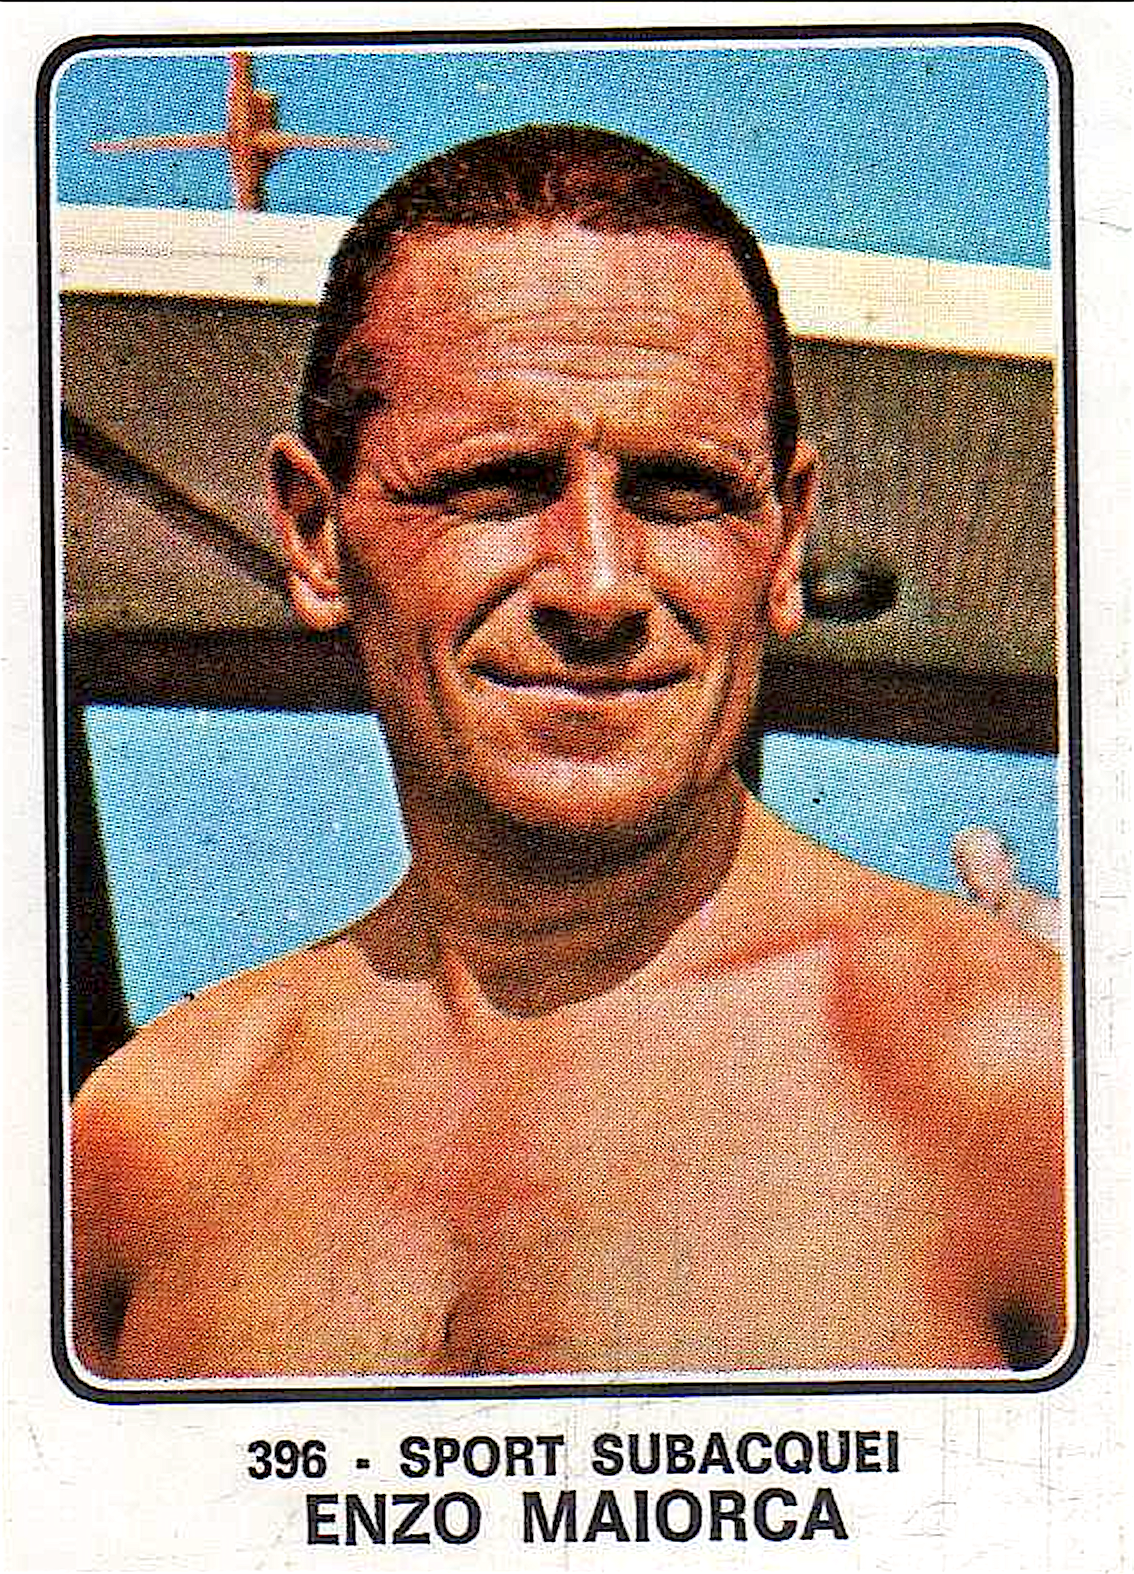 Enzo Majorca